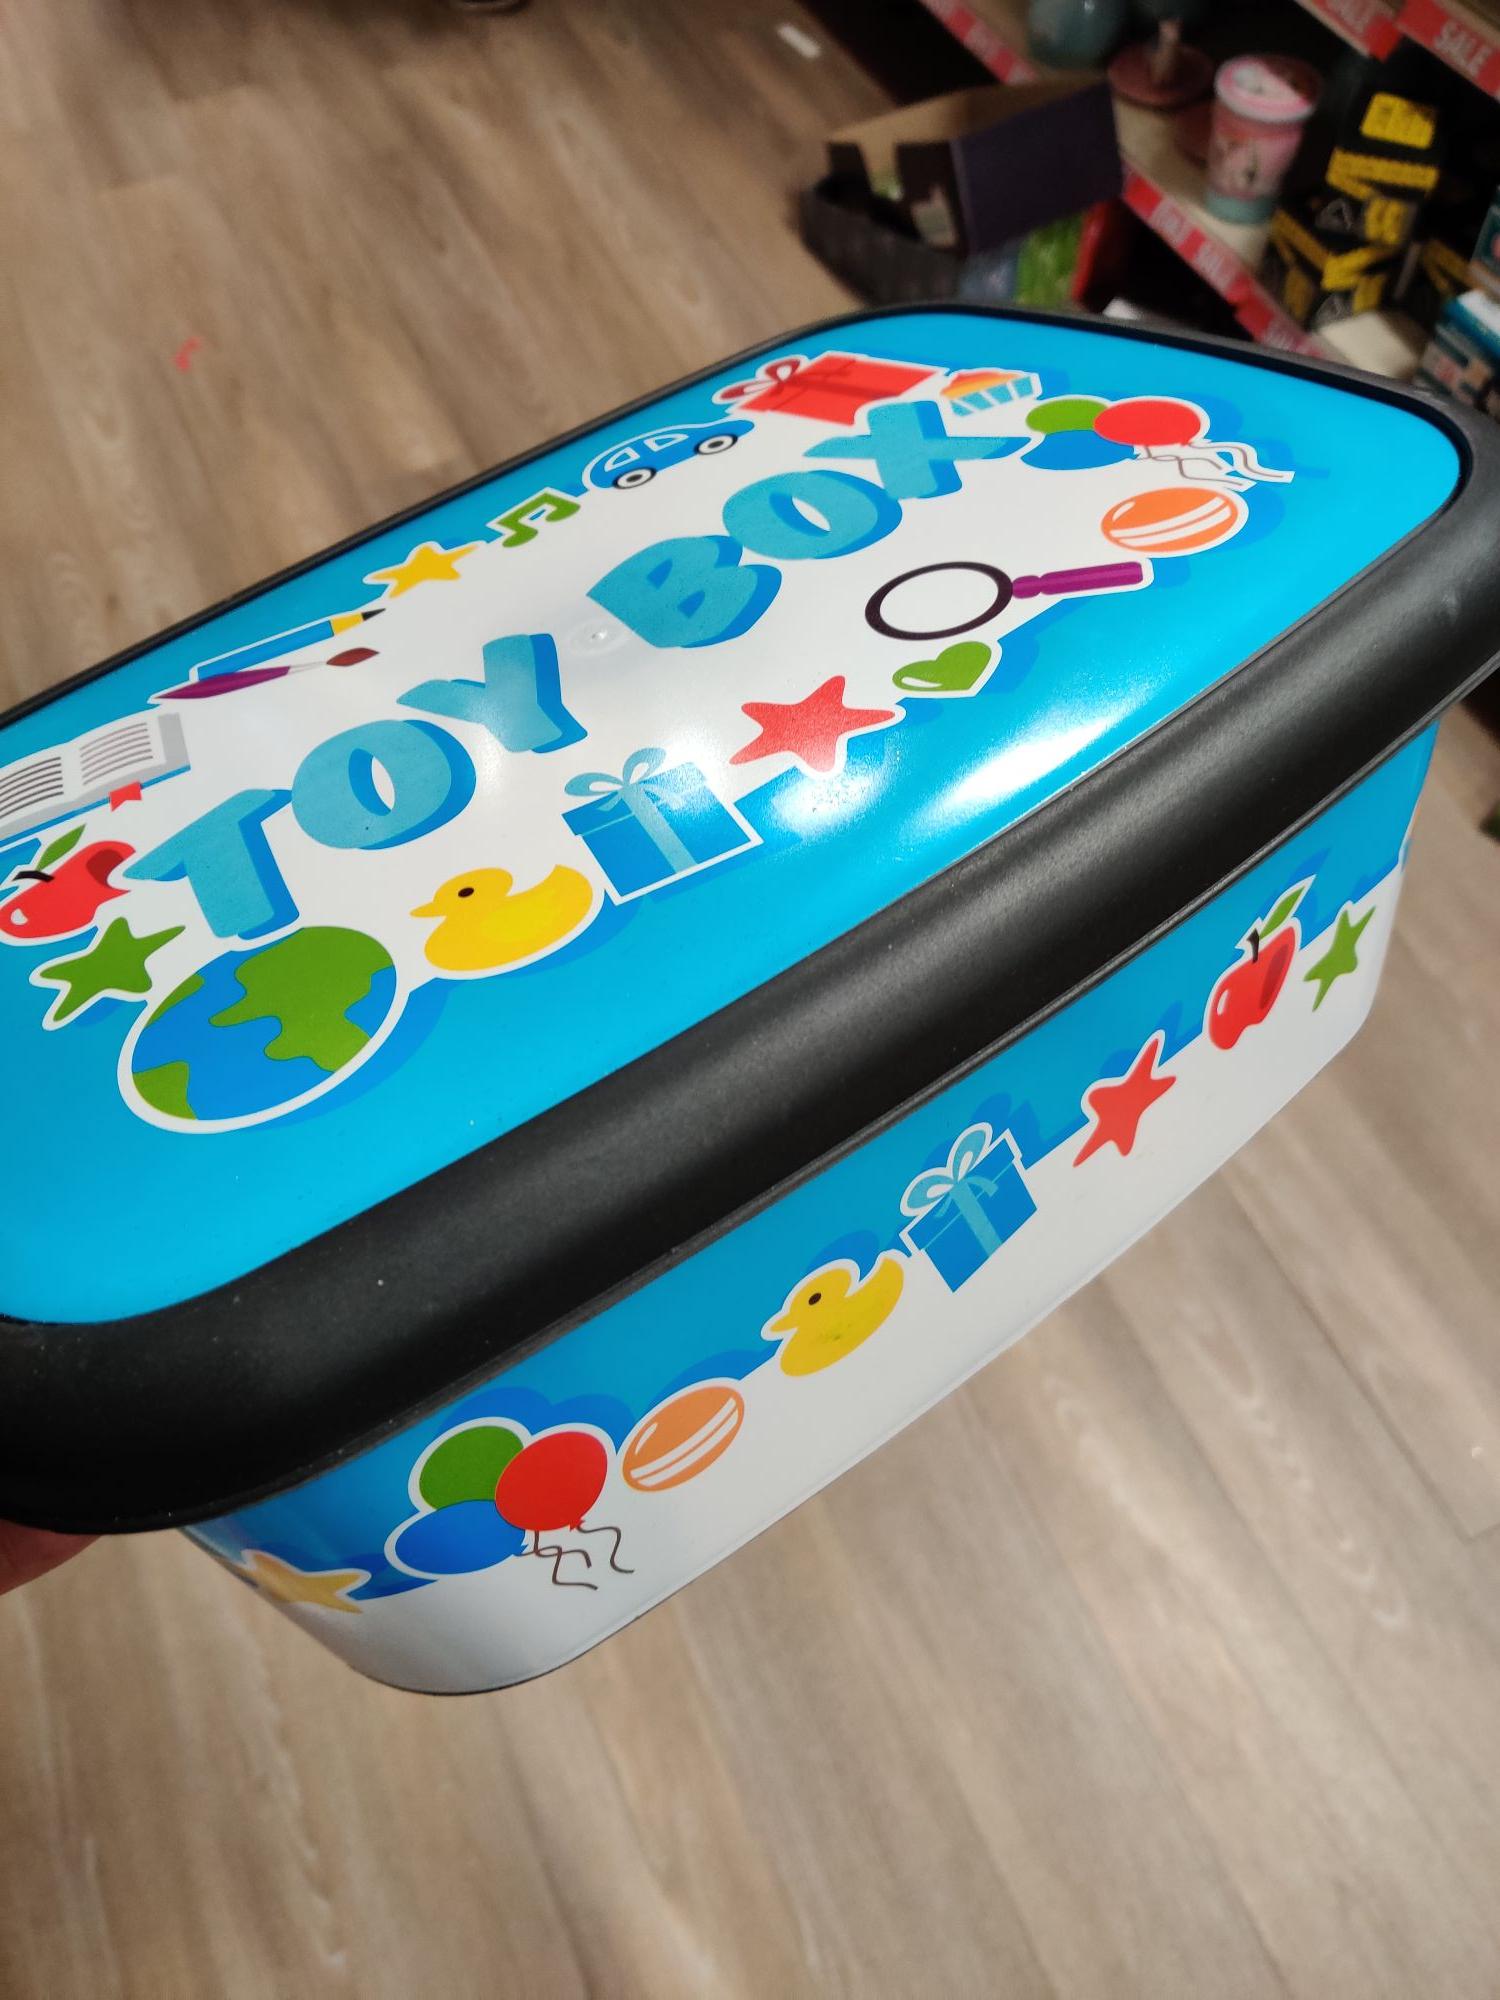 Toybox storage box 50p @ Poundland (Sevenoaks)